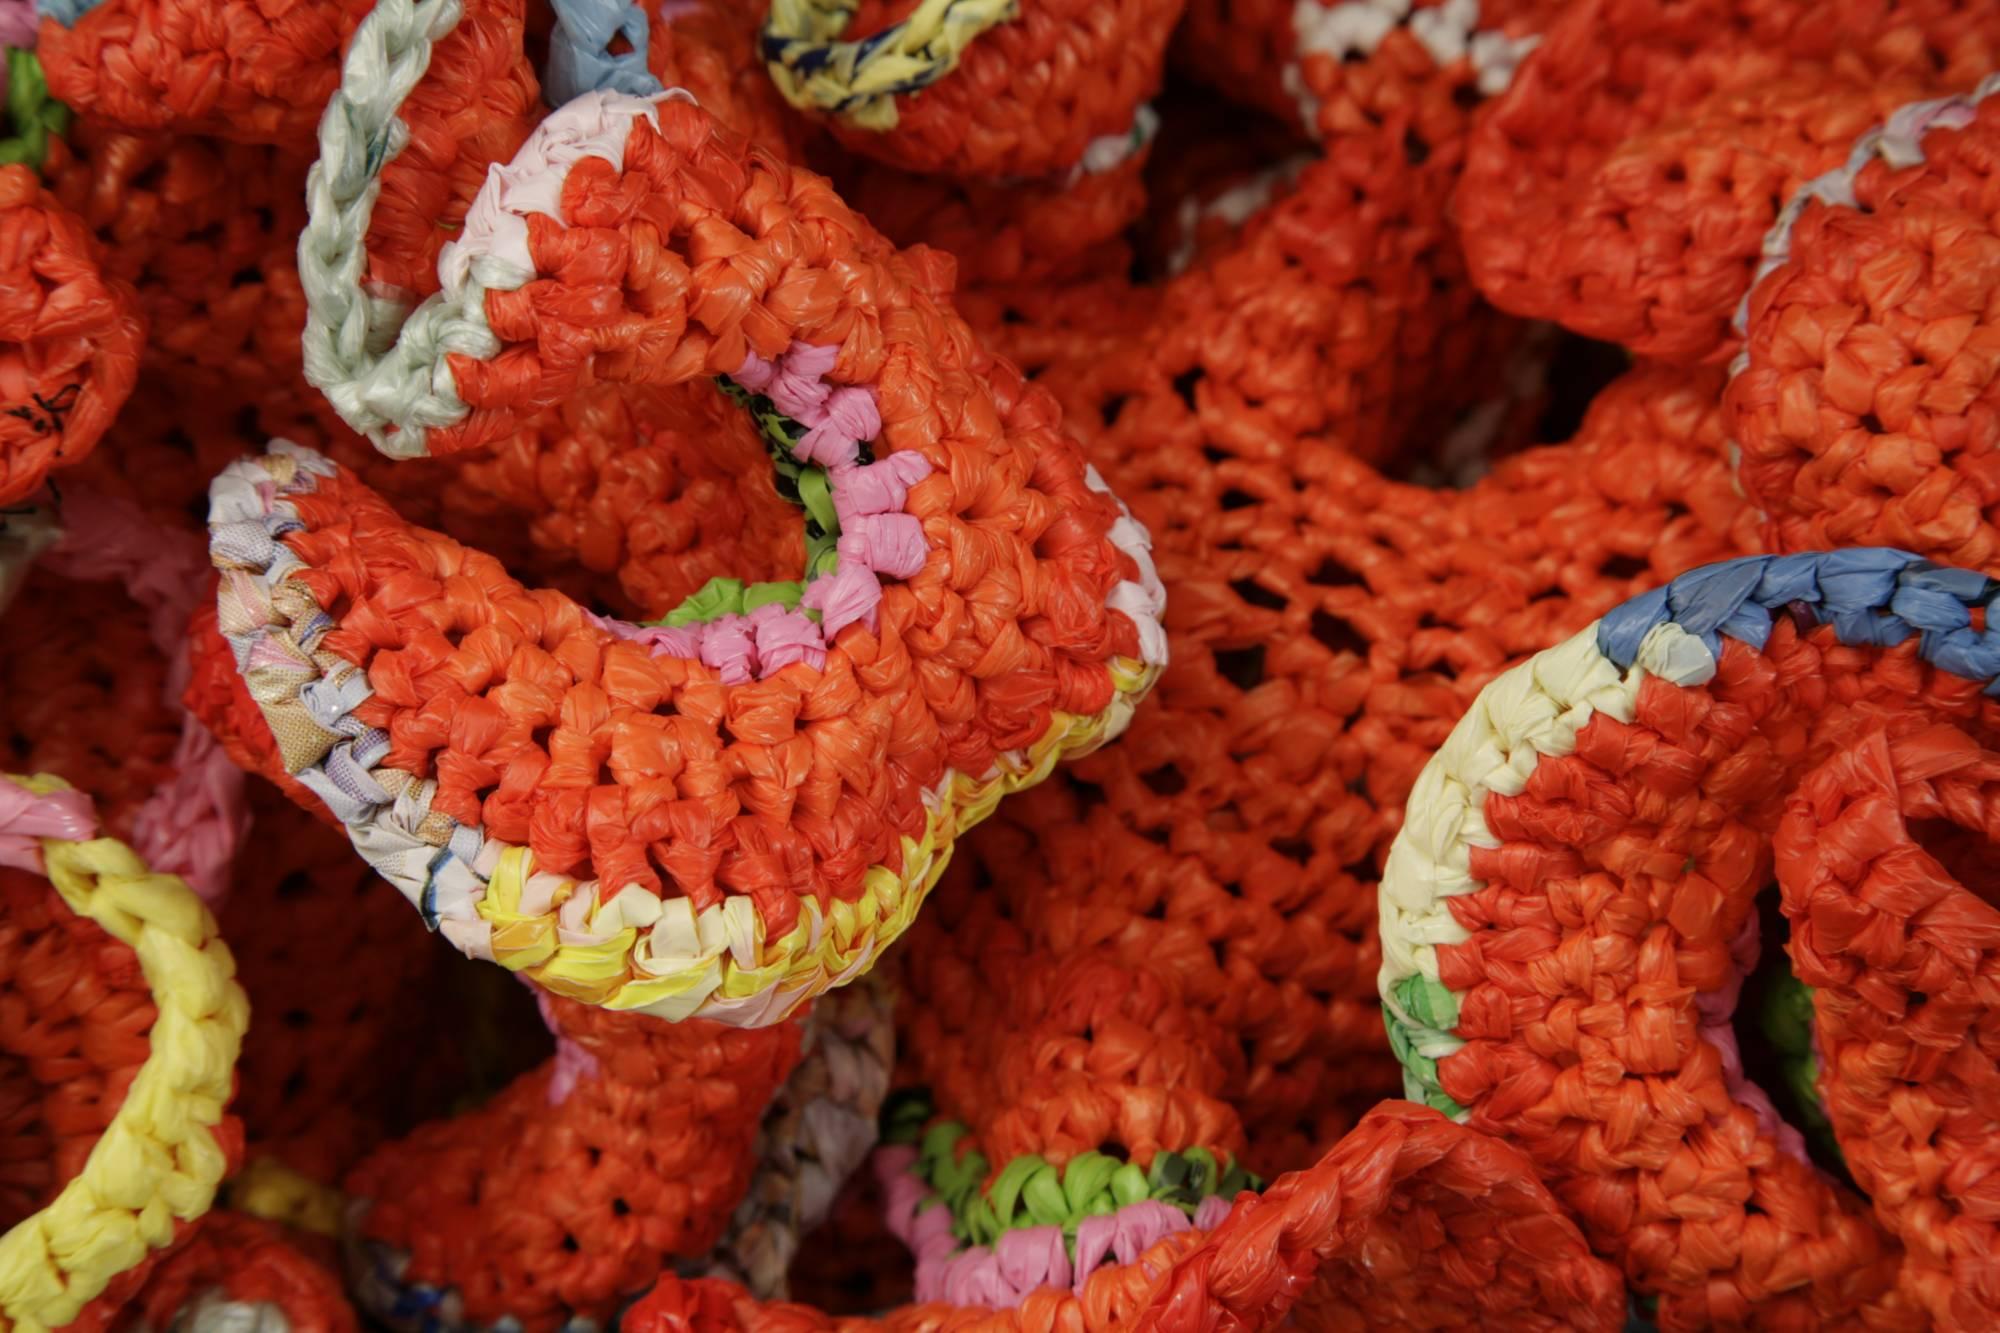 crocheted plastic coral made of orange plastic